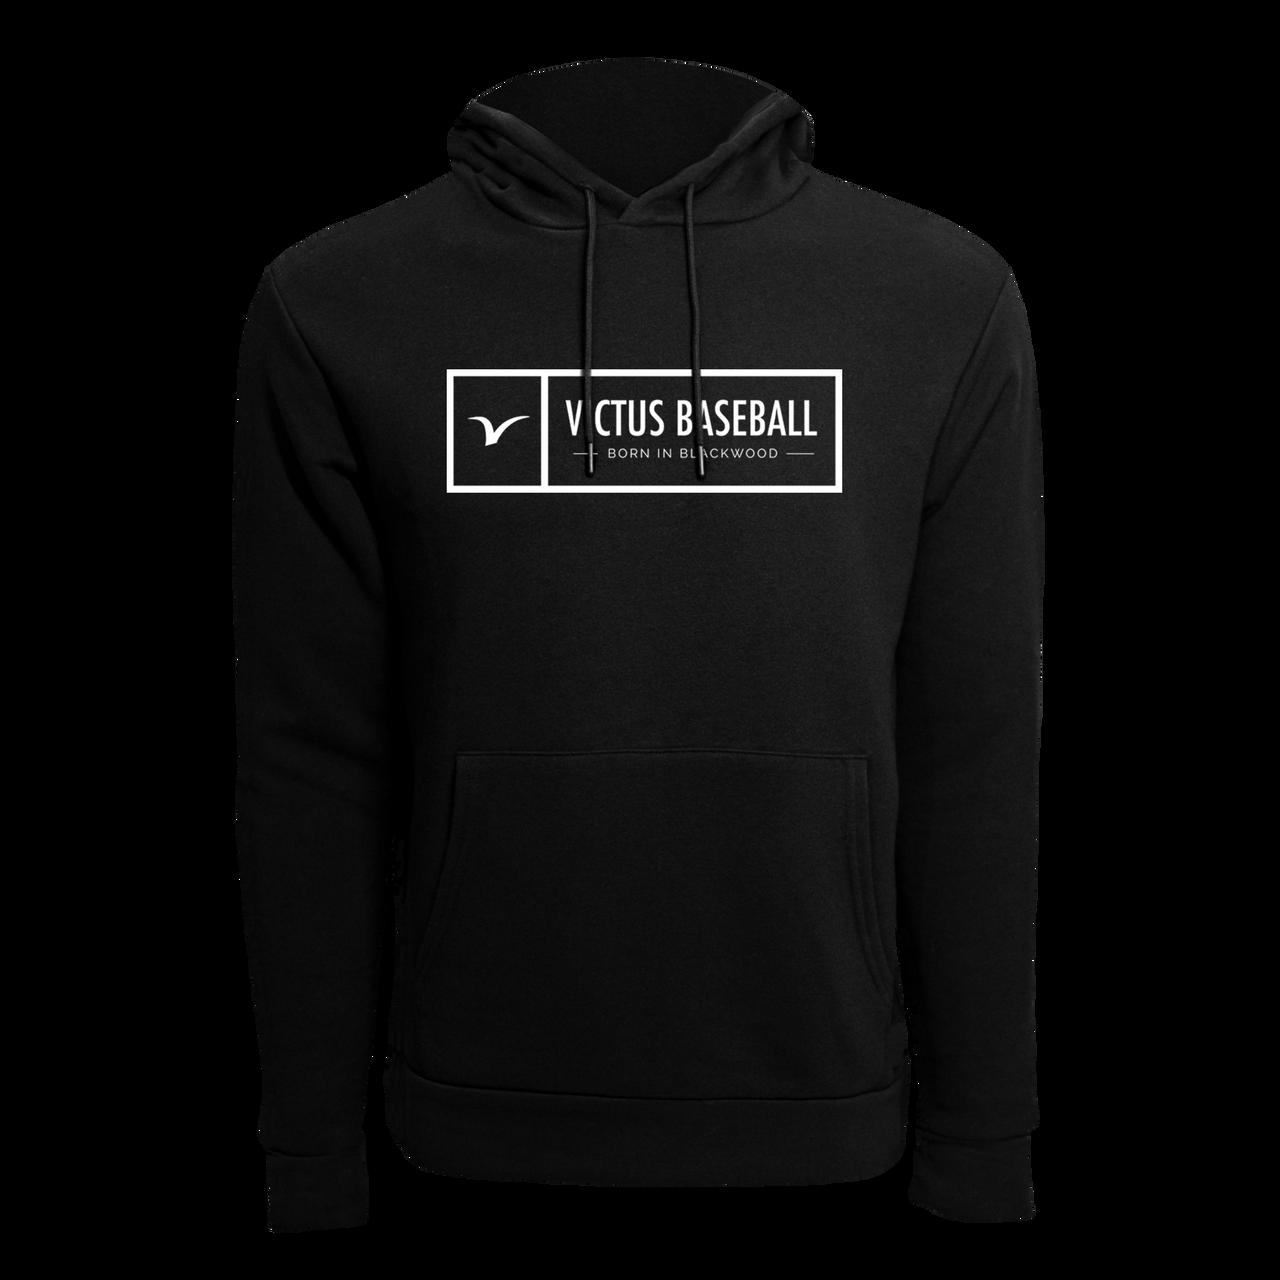 V-Label Hoodie